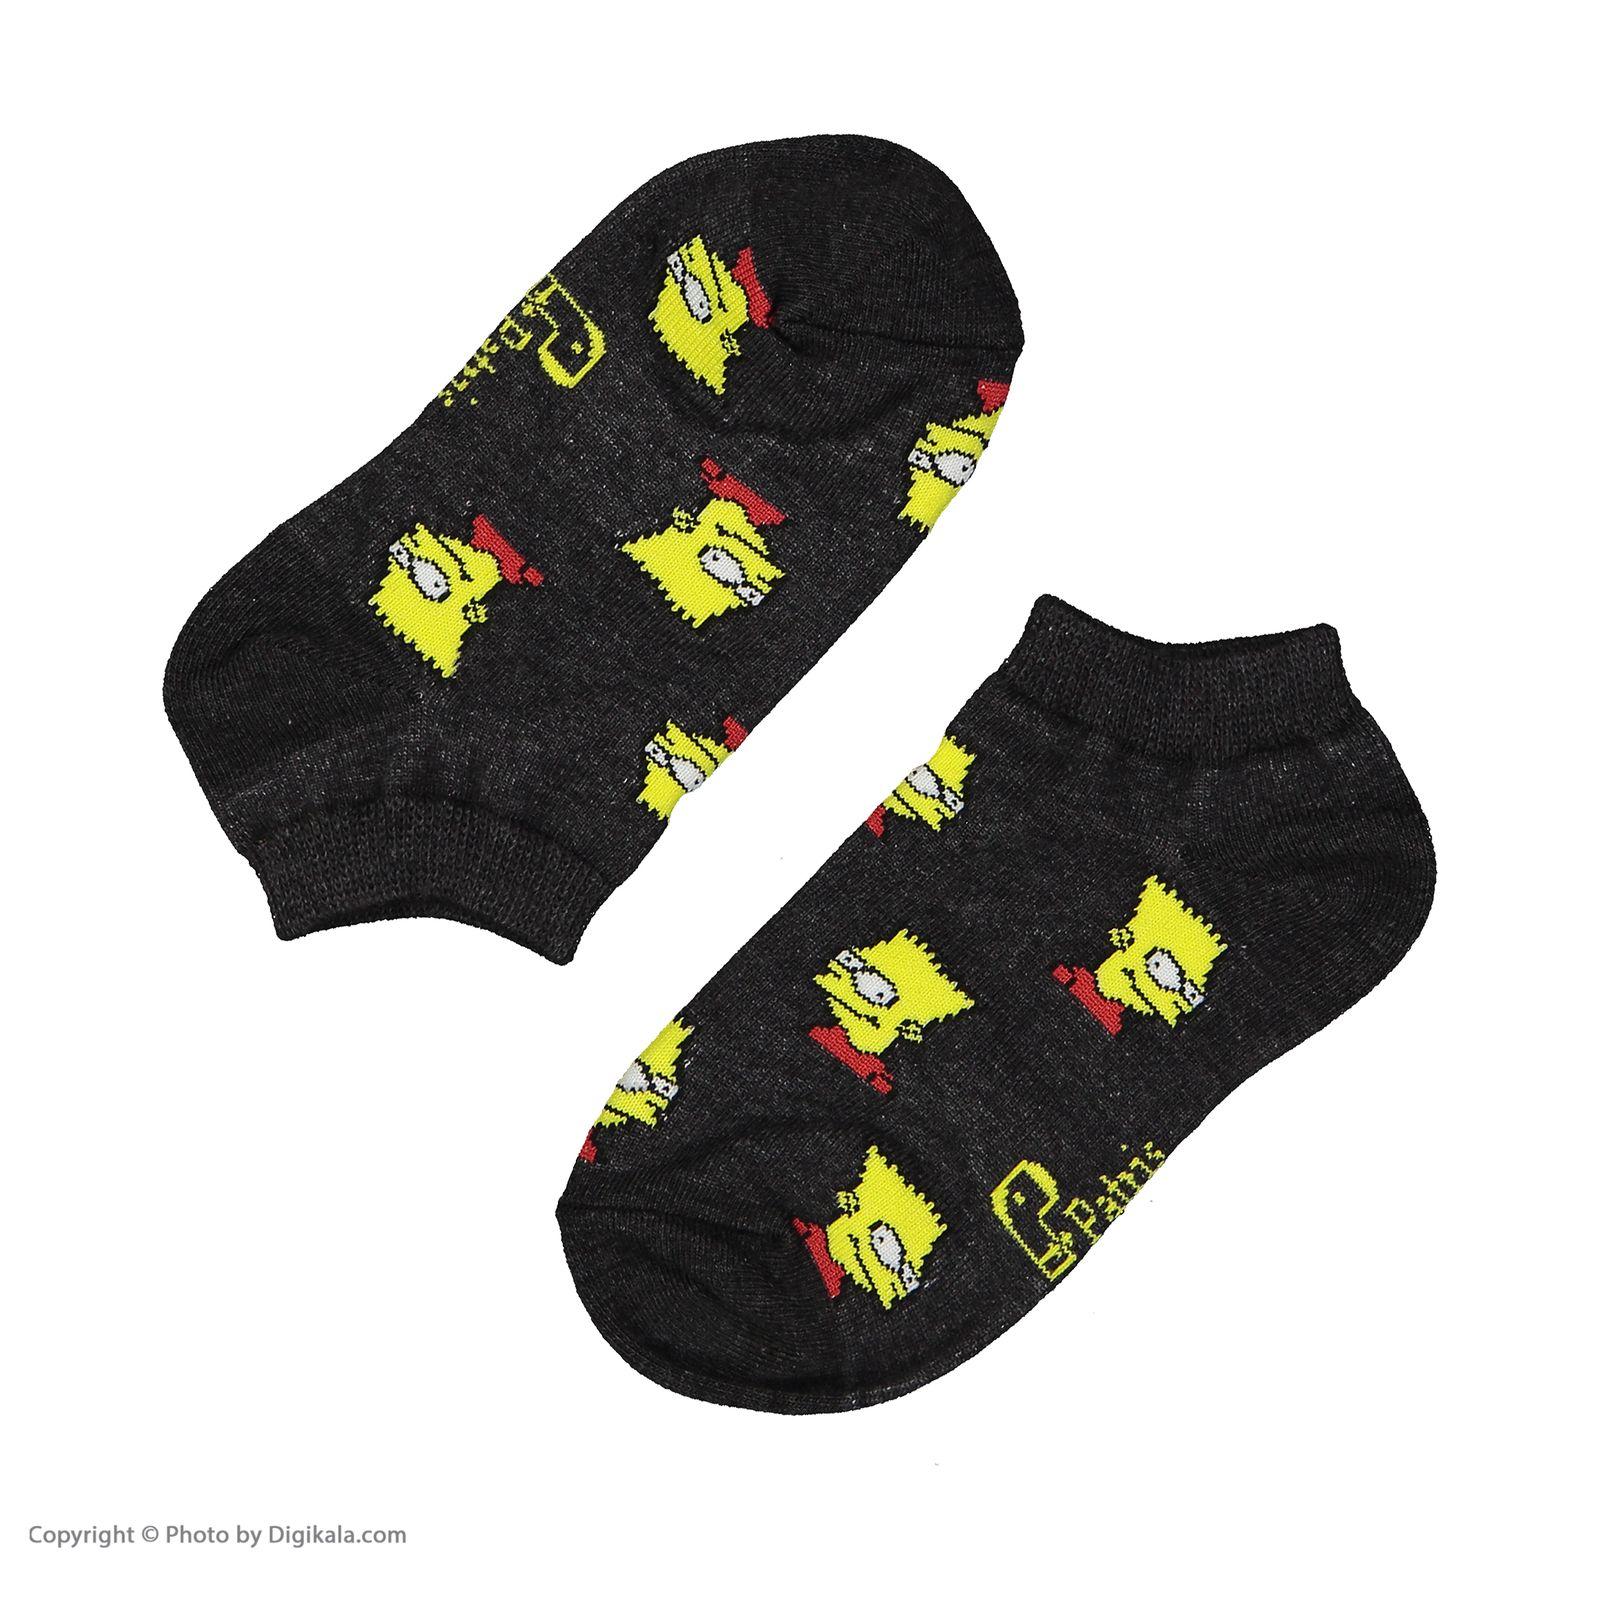 جوراب بچگانه پاتریس طرح سیمپسون مدل 2271192-94 -  - 3